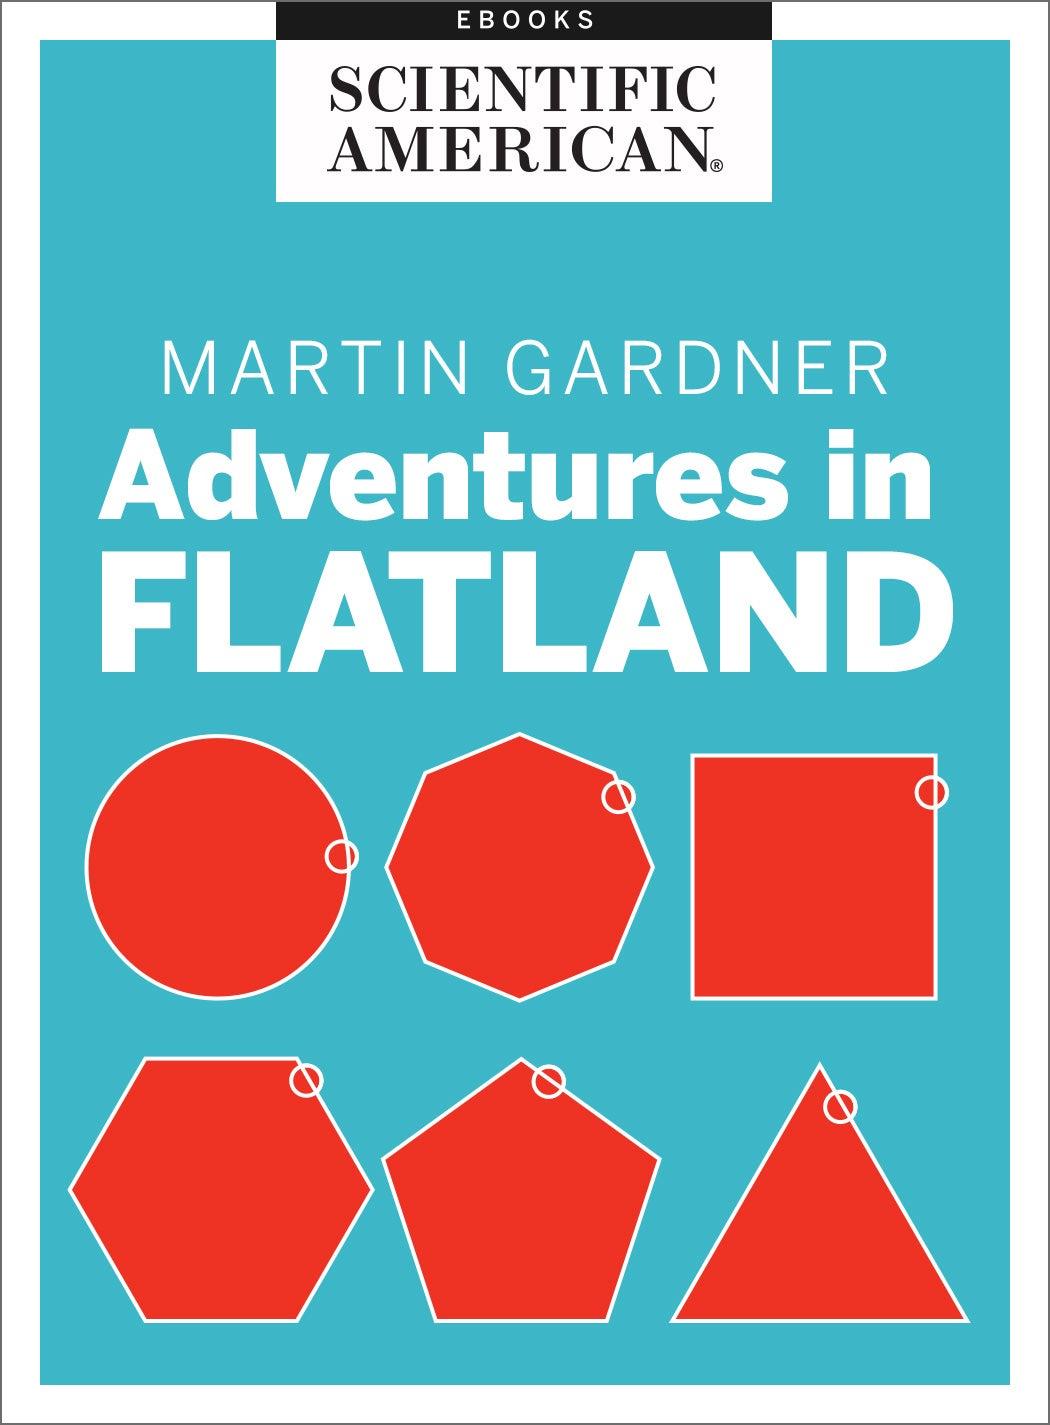 Martin Gardner: Adventures in Flatland